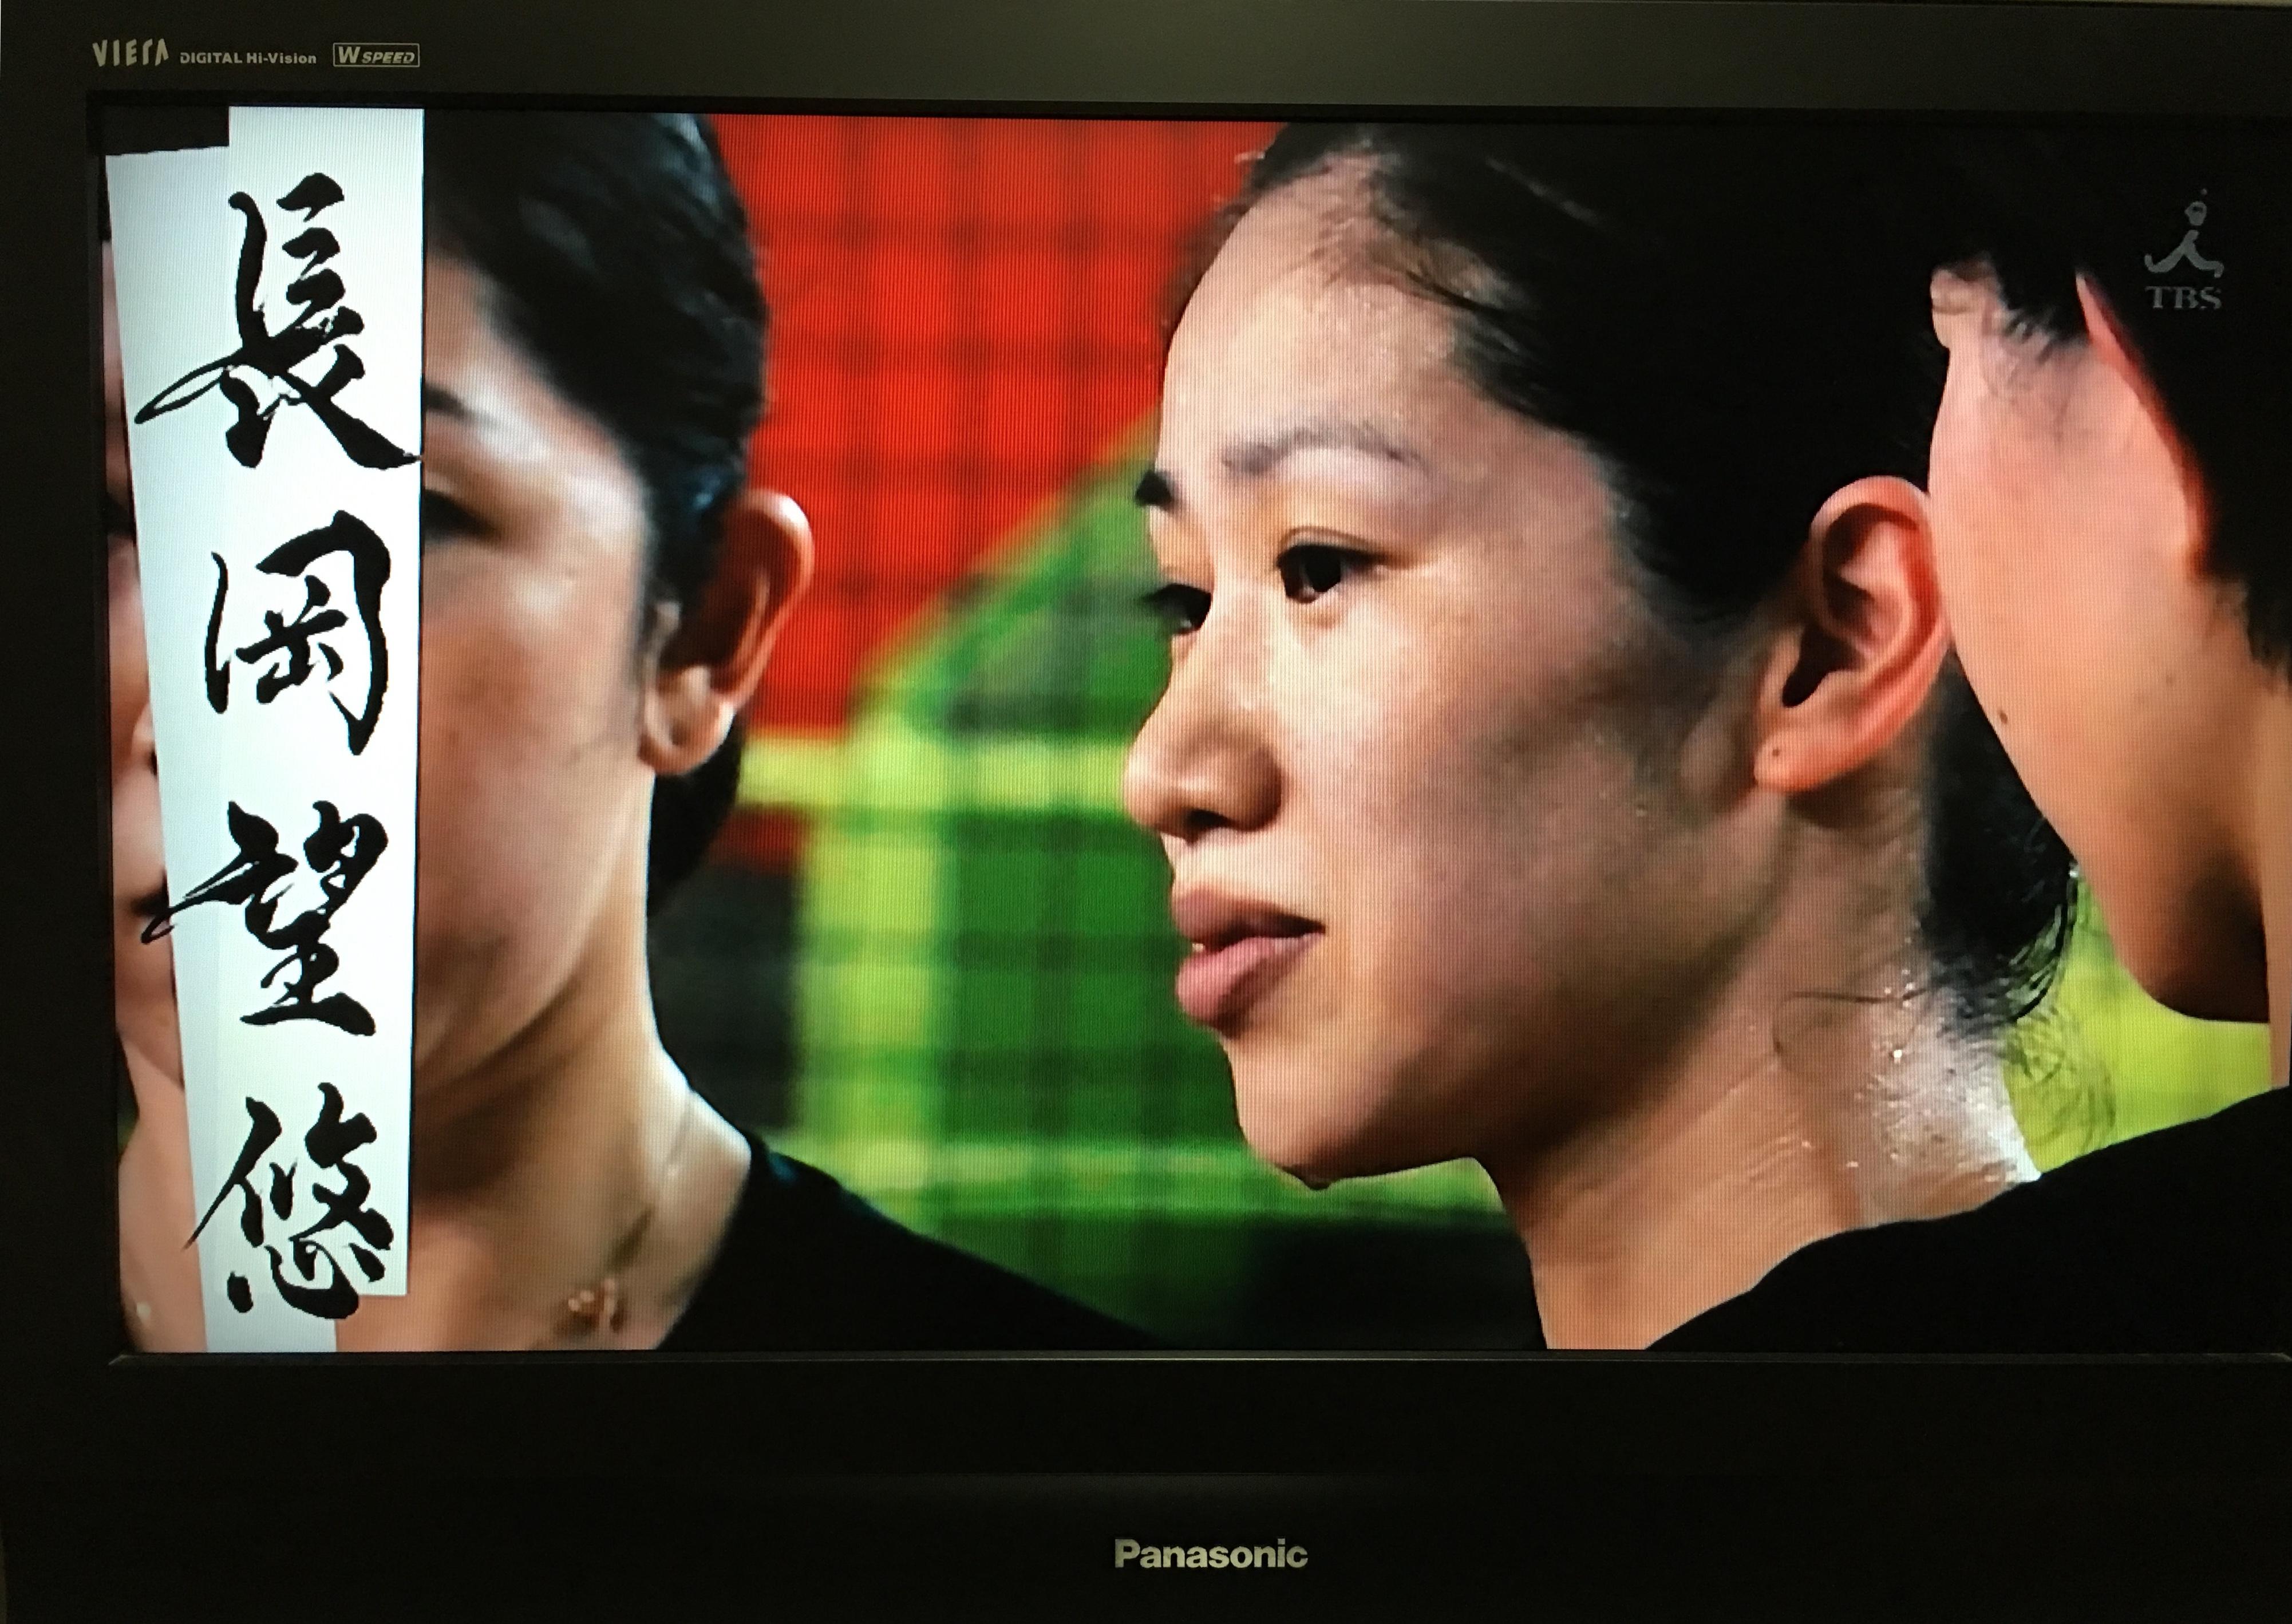 TBSテレビ「2018 世界バレー」事前番組使用作品『長岡望悠』